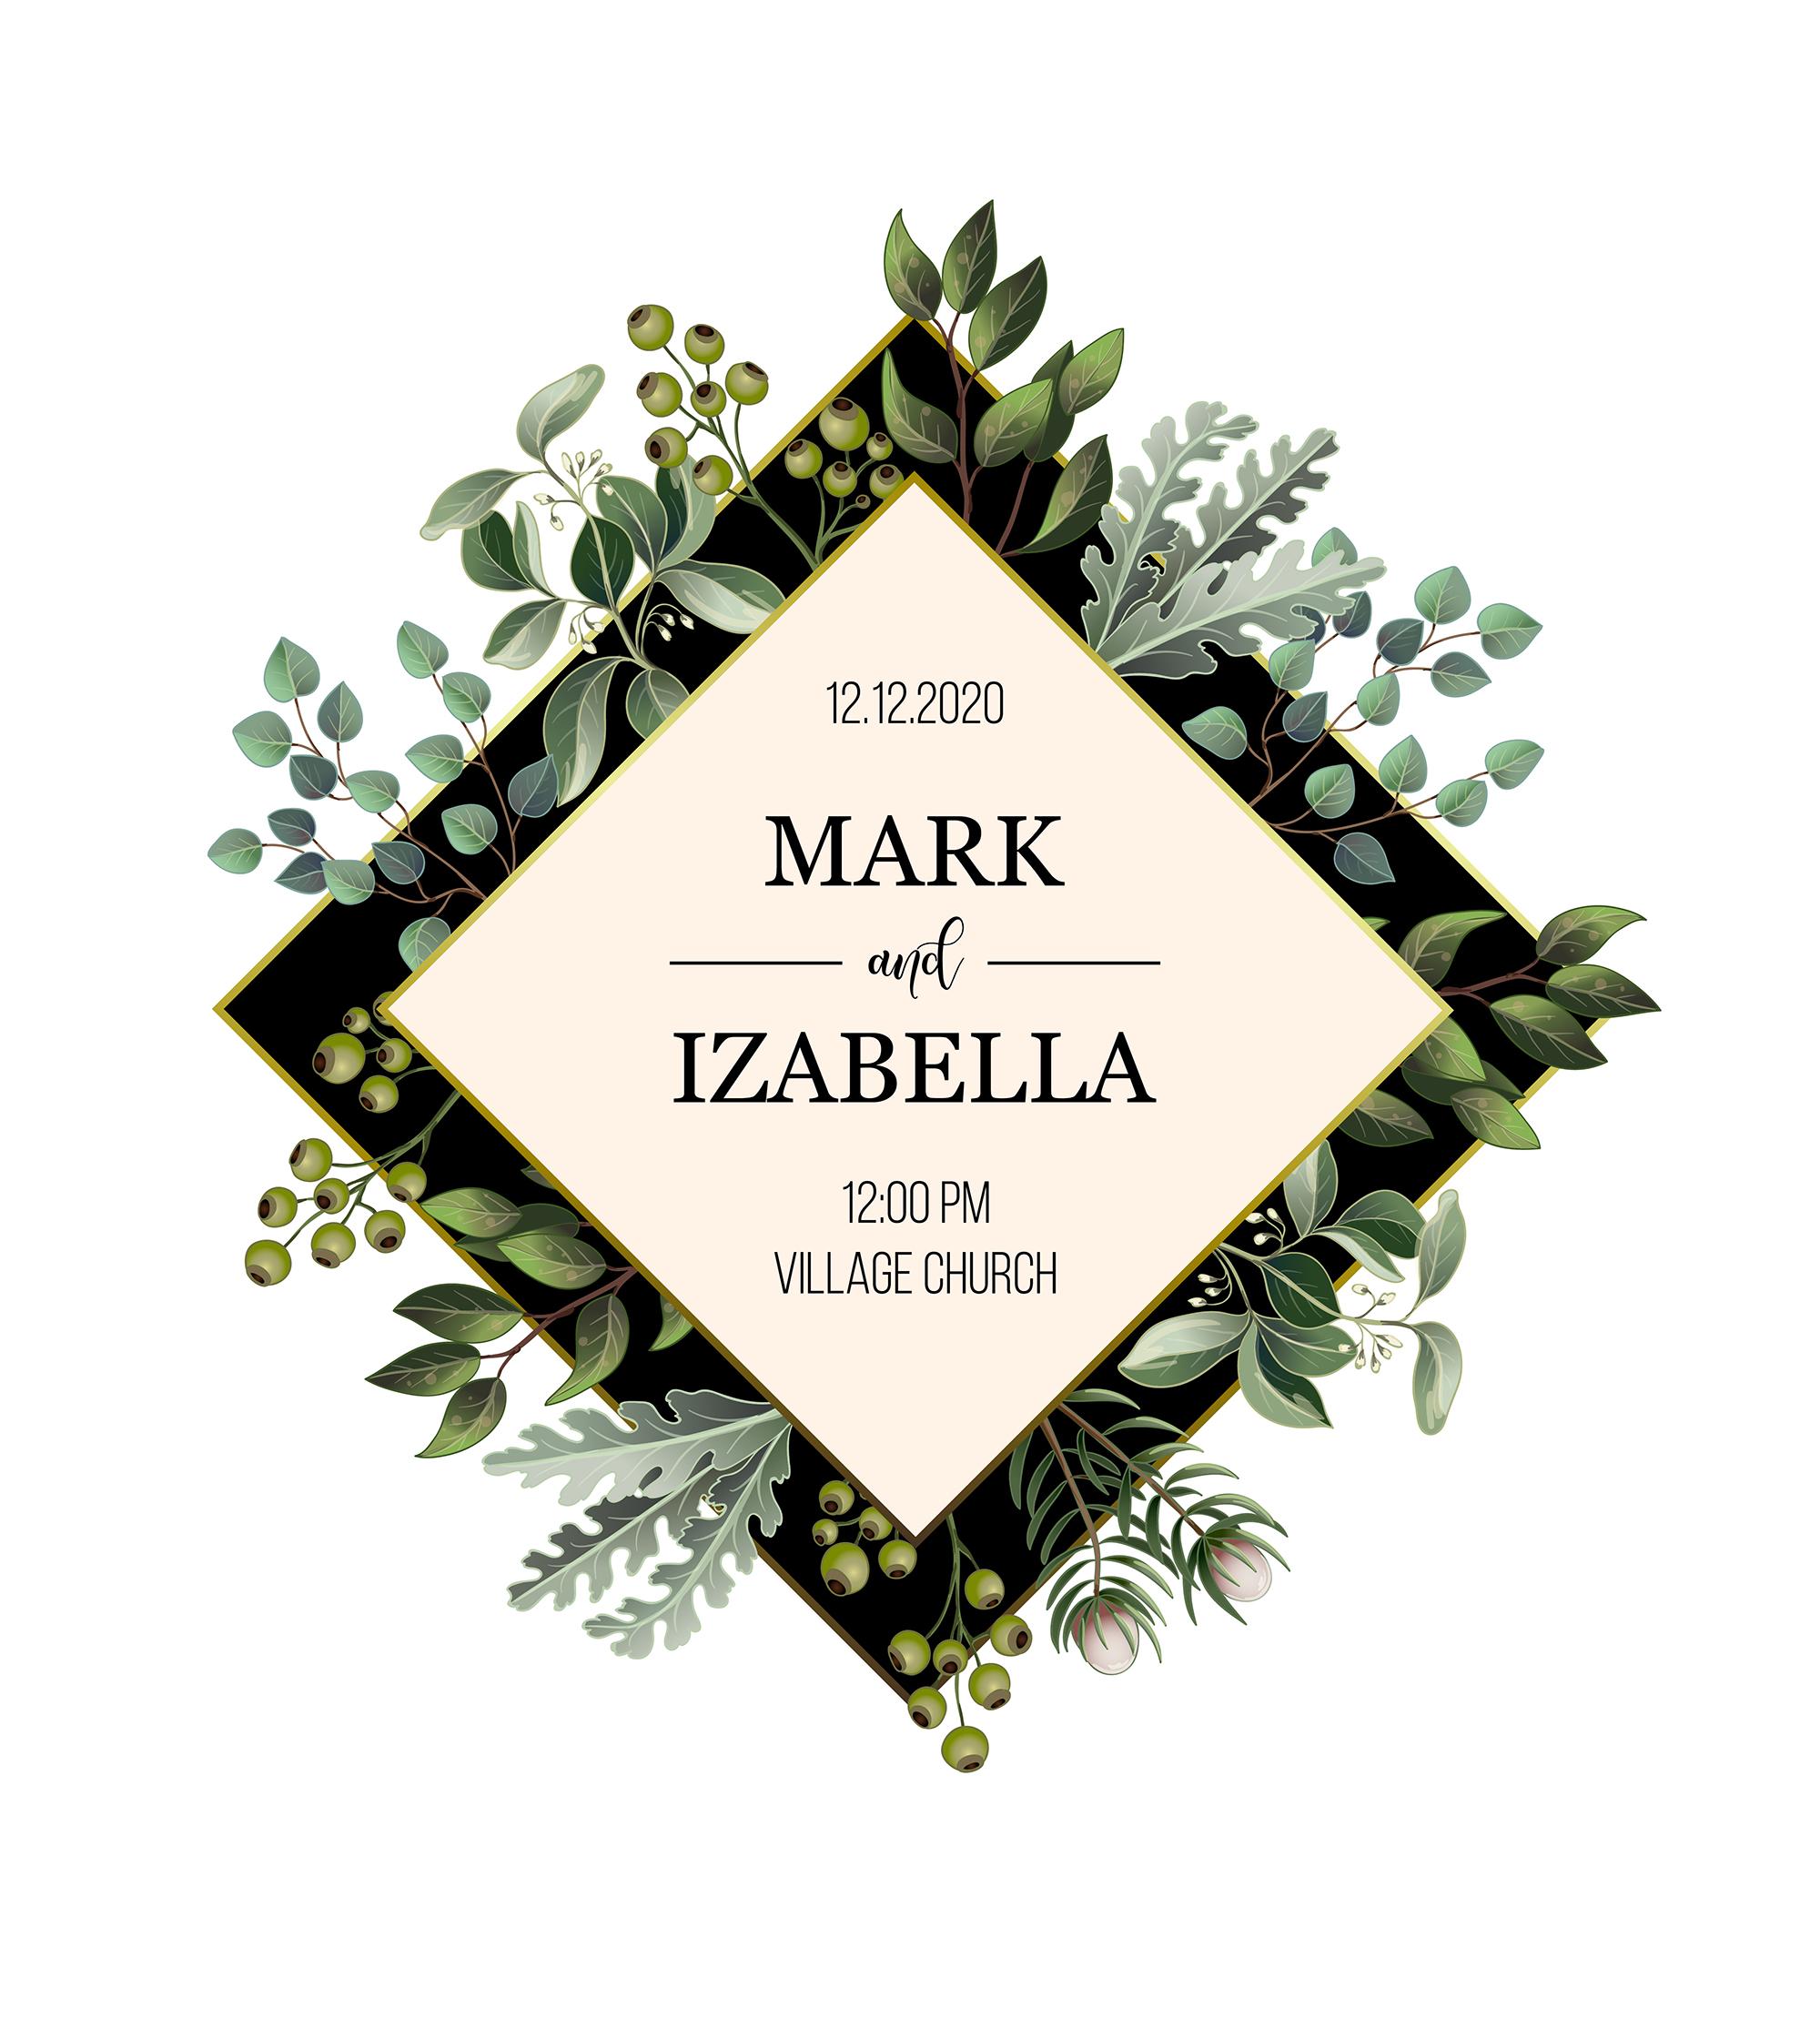 Wedding greenery invitation, patterns and isolated elements example image 3